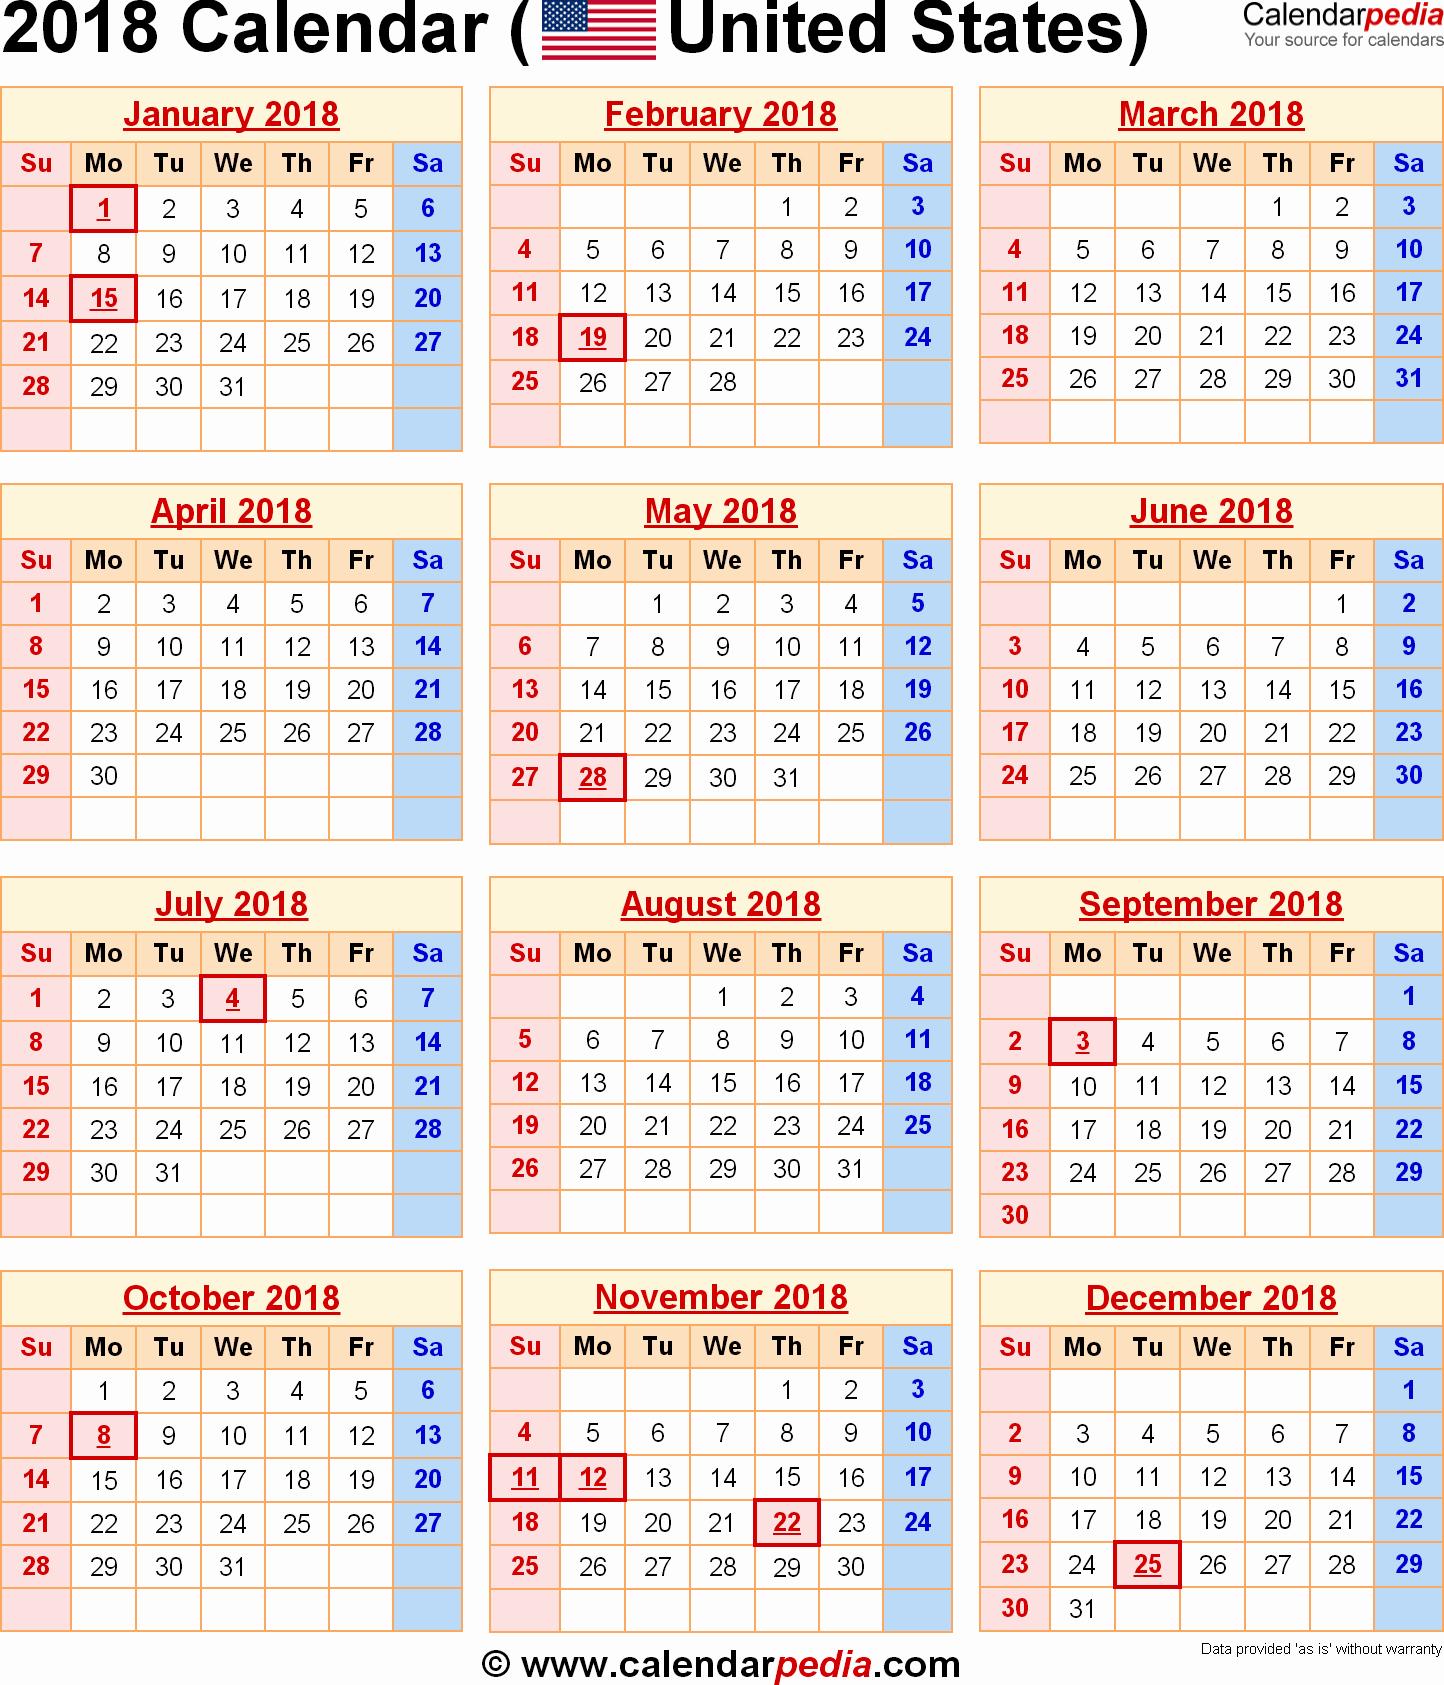 Free 2018 Calendar with Holidays